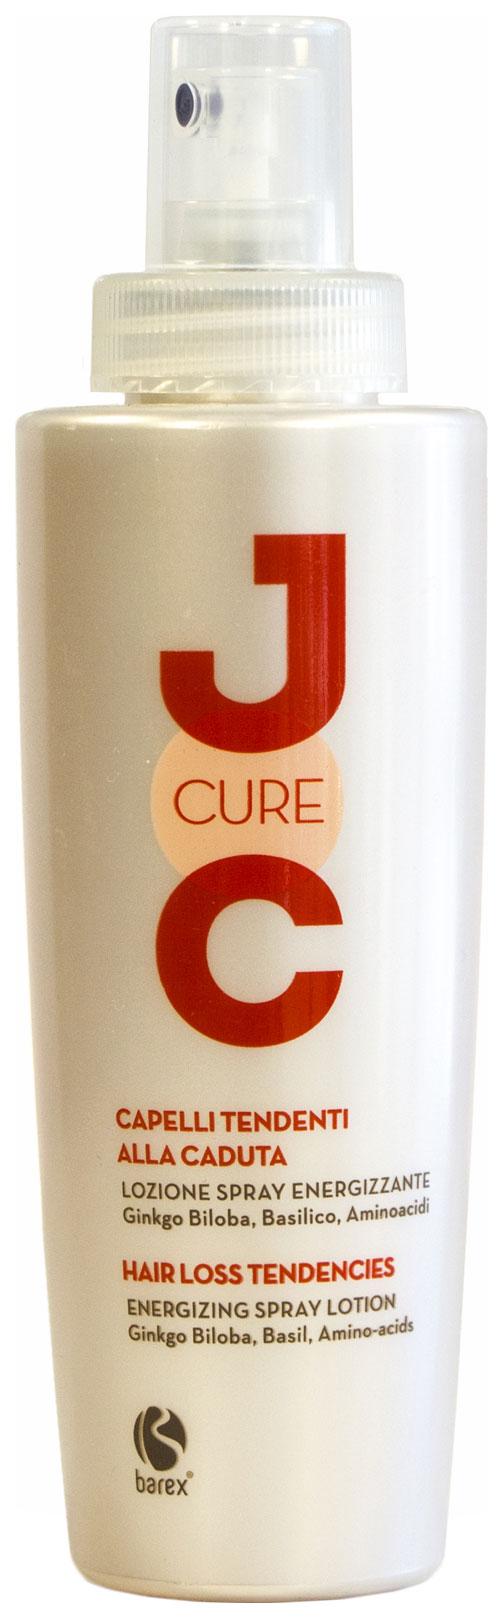 Лосьон для волос Barex Italiana JOC Care Lozione